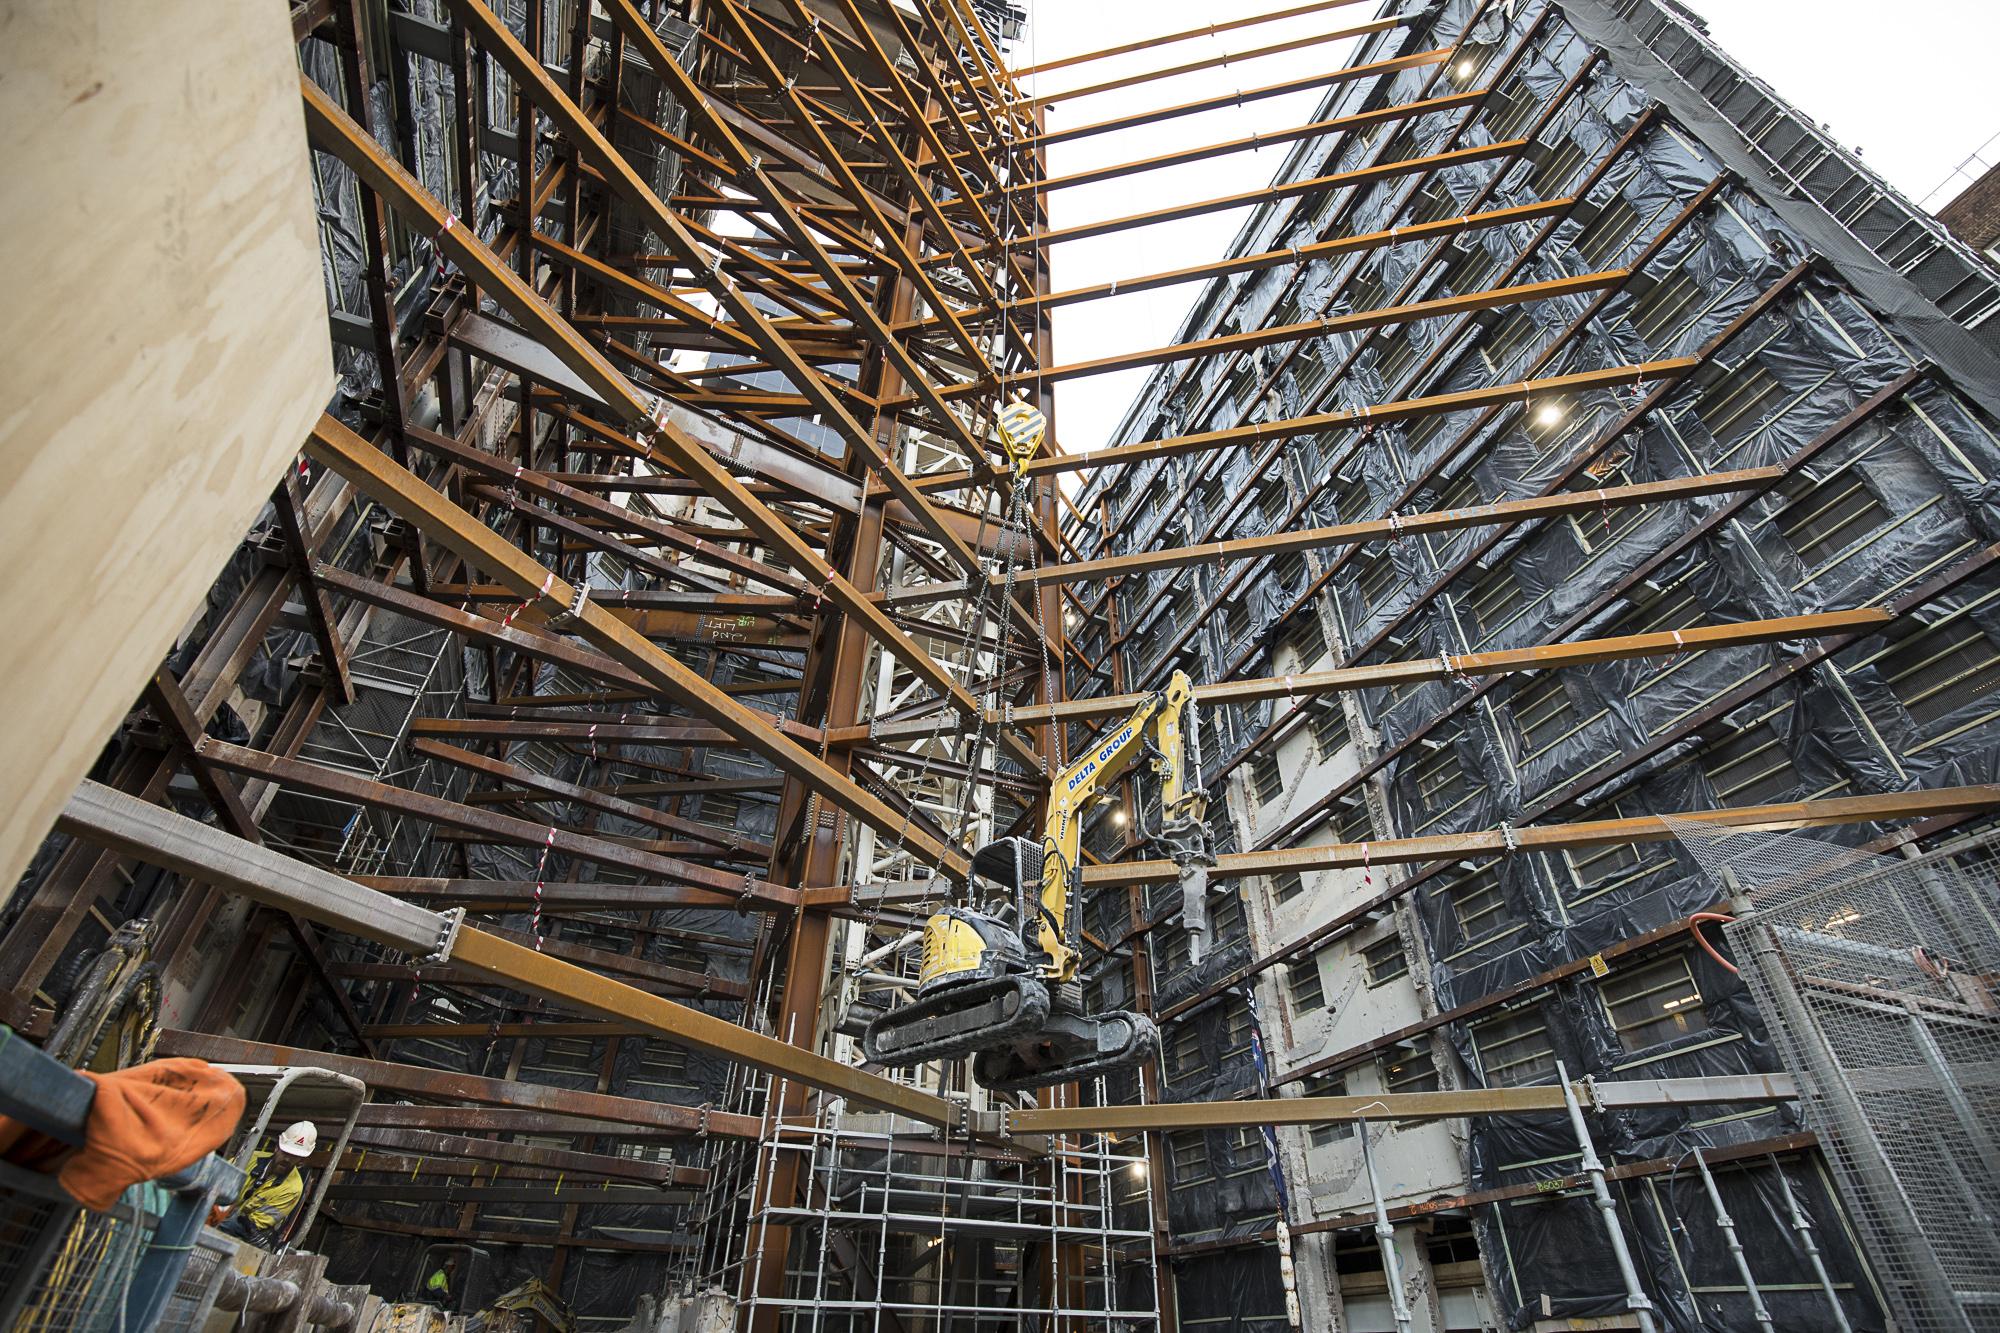 WP-029 - Shell House demolition at basem